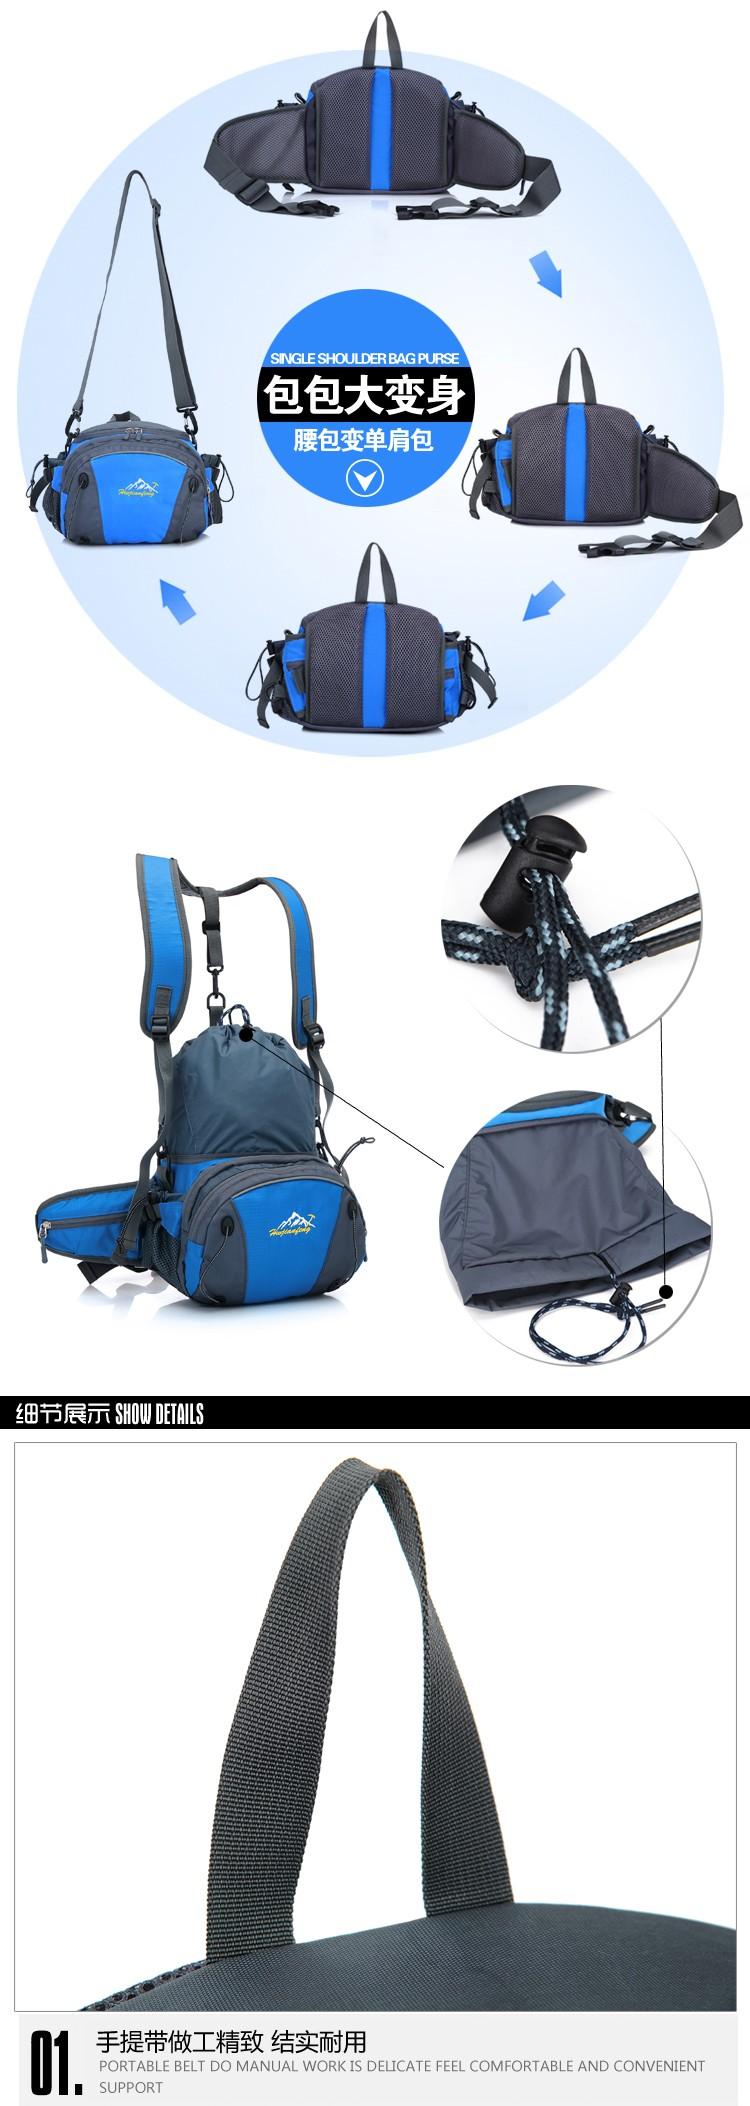 Men Women Sport Waist Bag Pack Backpack With Bottle Holder Outdoor Exploration Travel Casual Cycling Gym Storage Bag Packs (19)